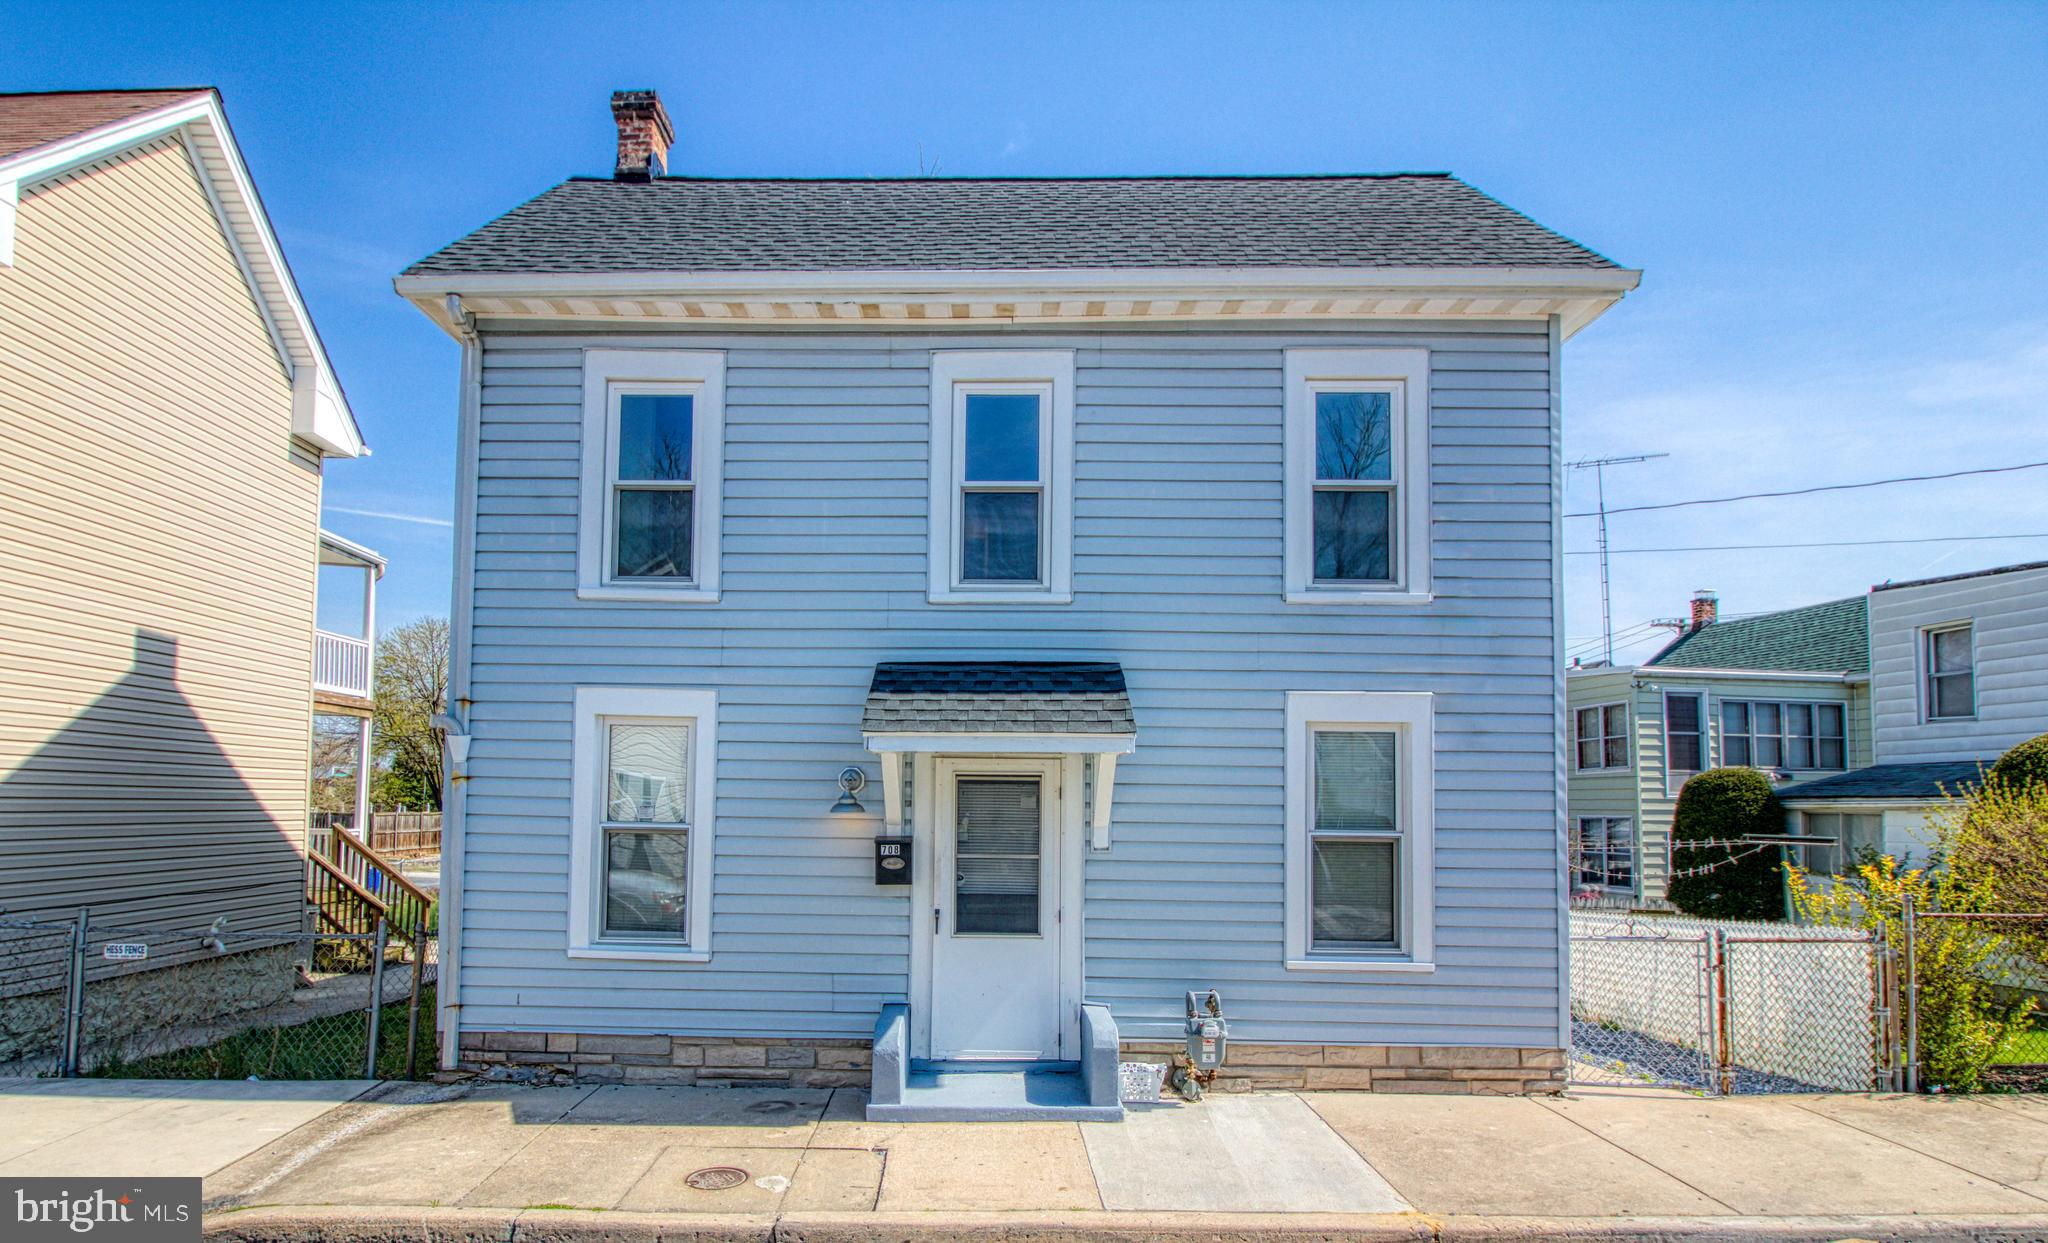 708 George Street, Hagerstown, MD, 21740